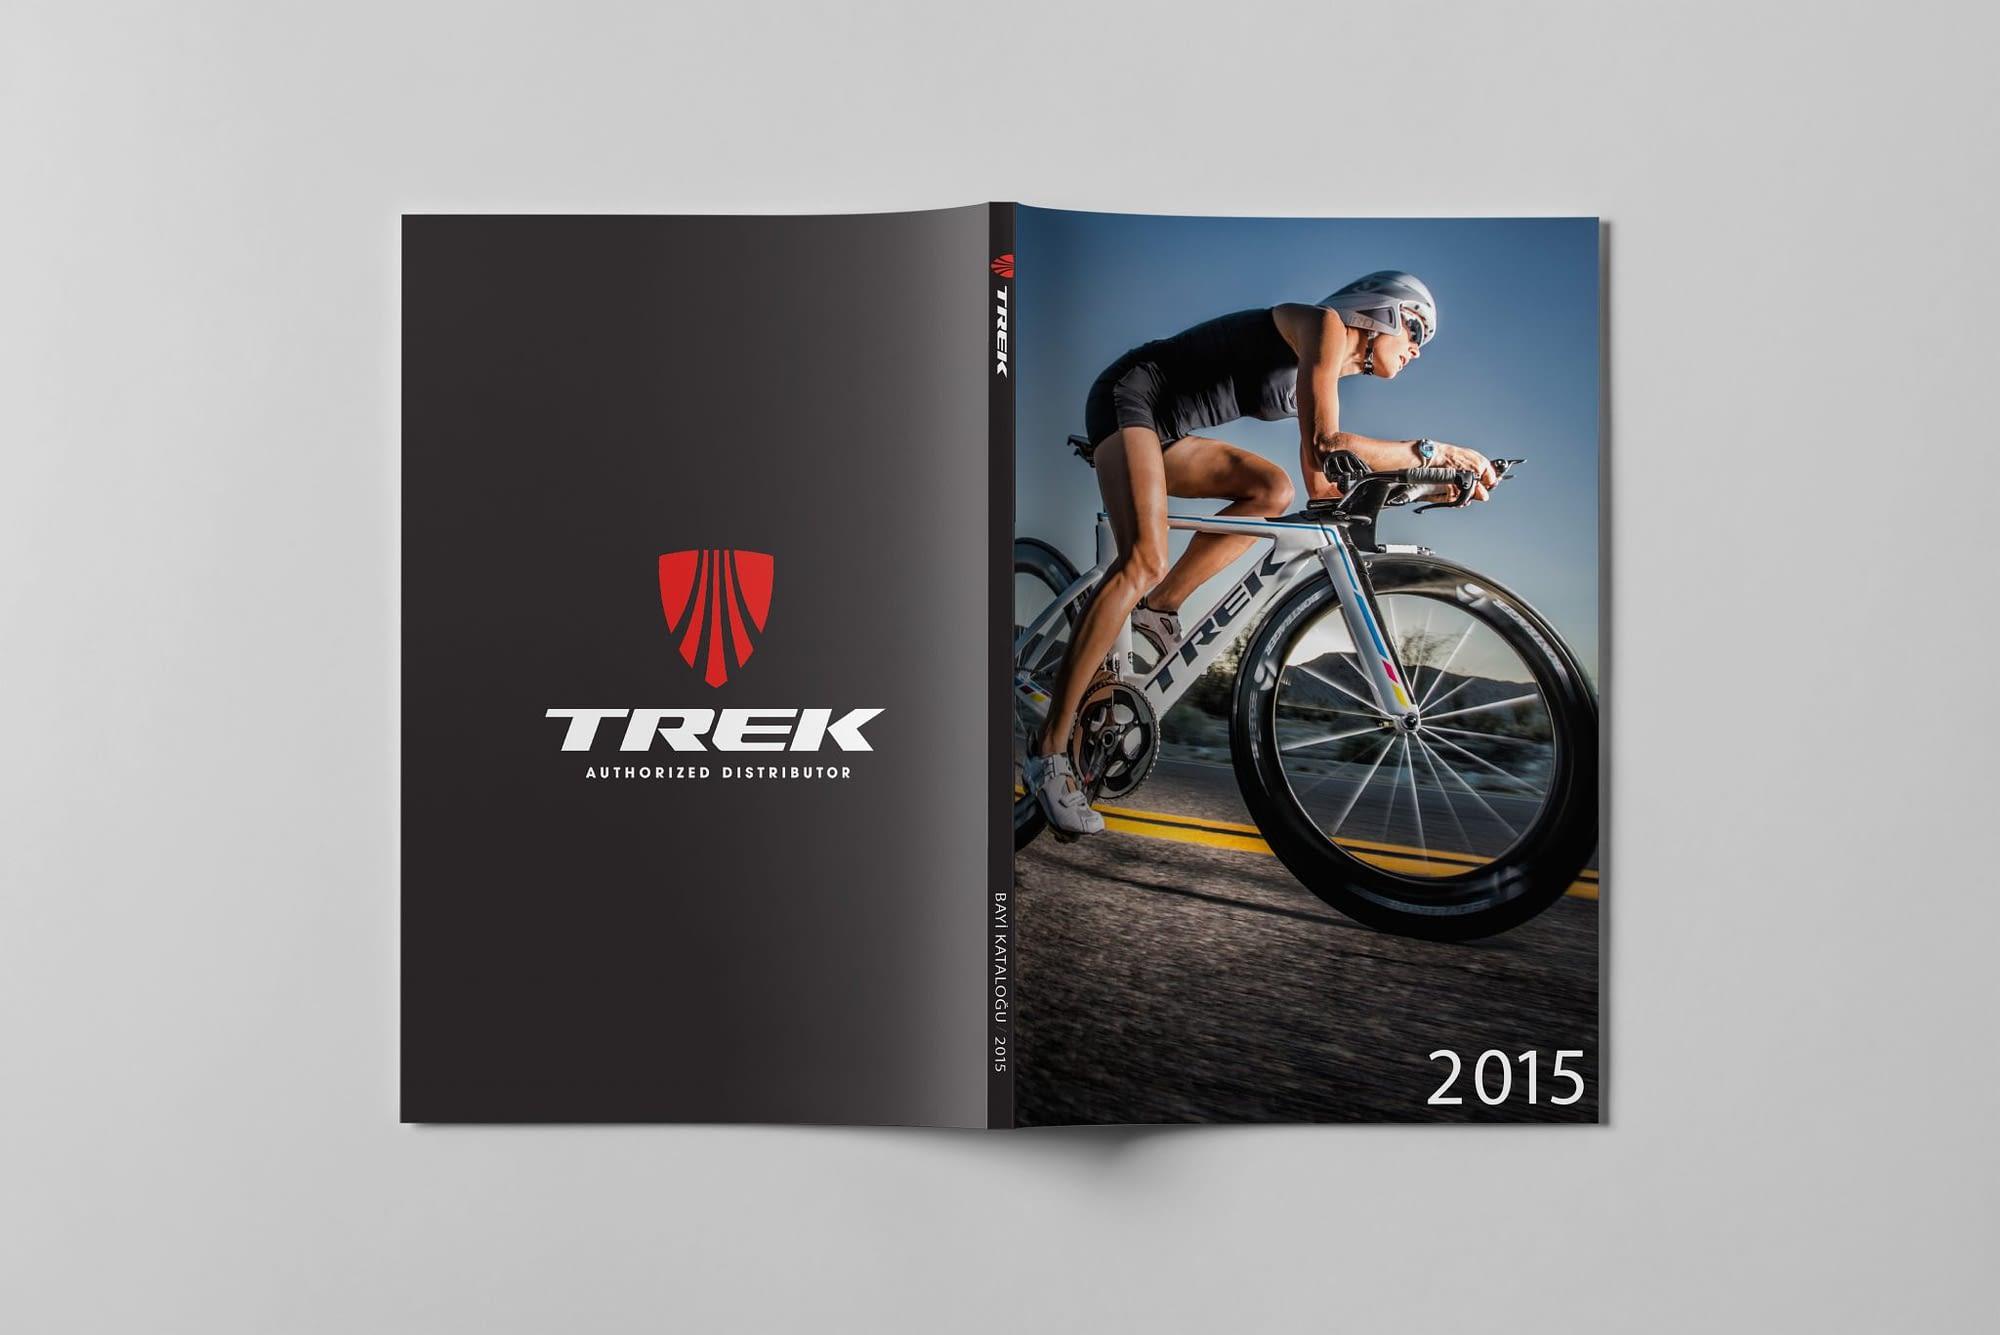 trek-2015-katalog-tasarimi